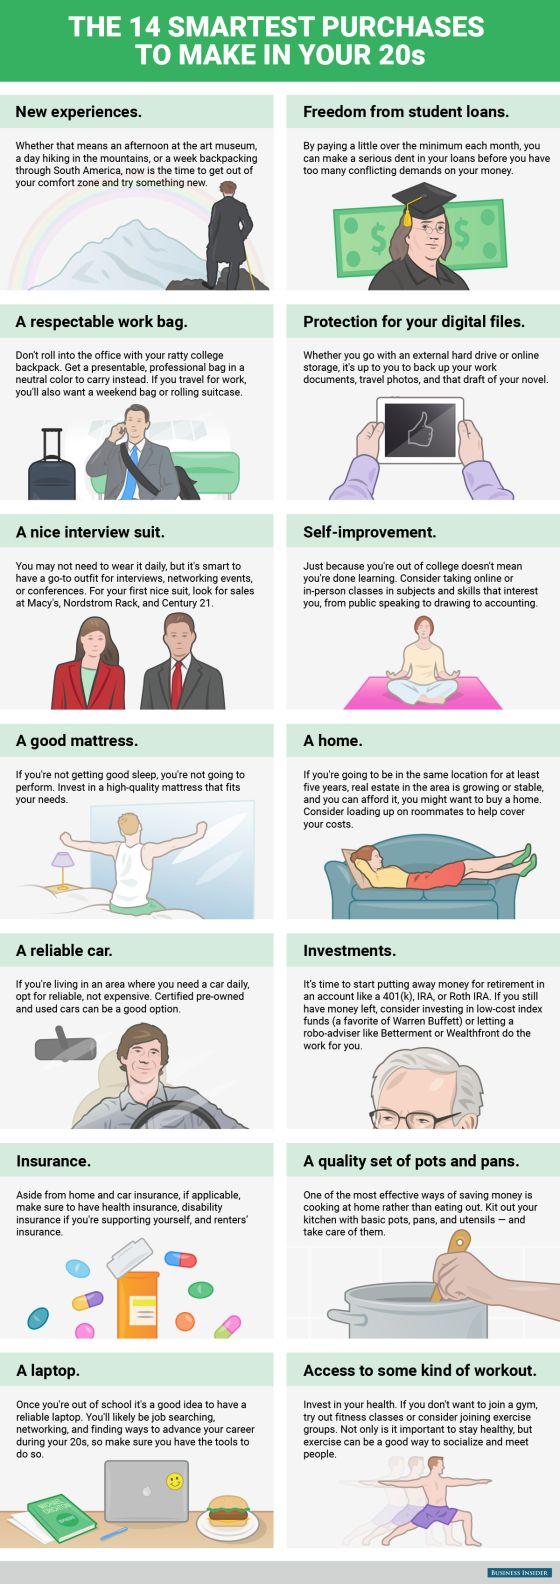 60 best career advice images on pinterest career advice career